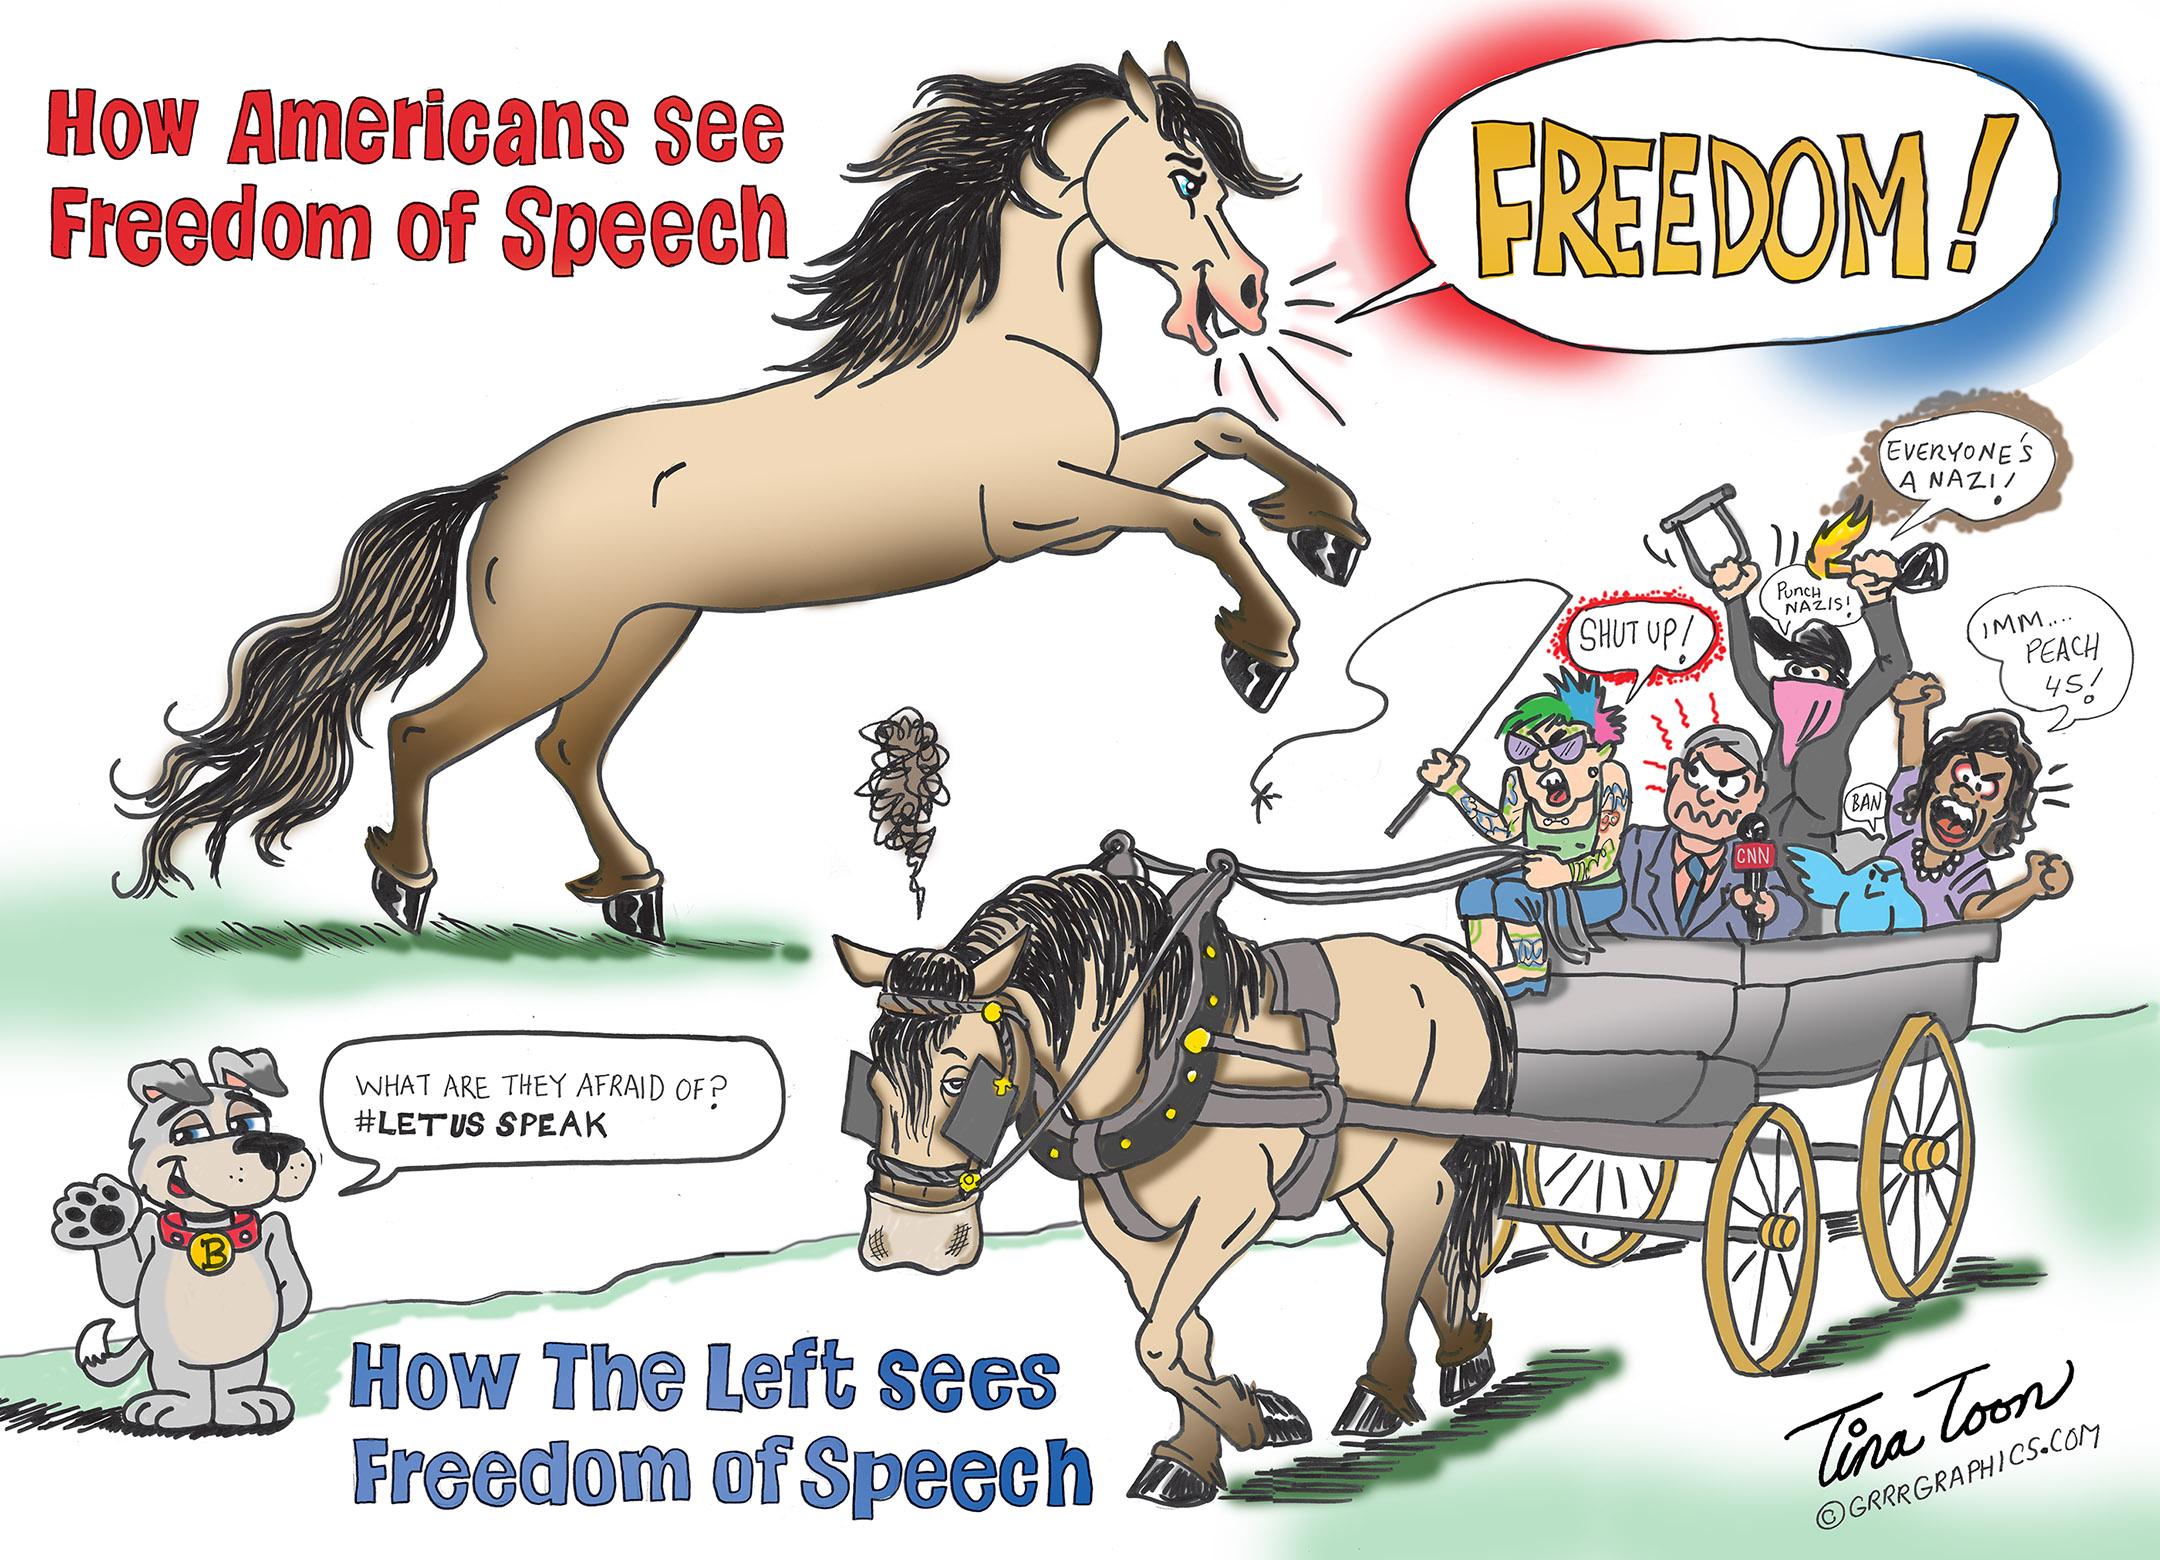 [Image: freedom-of-speech-horse-Tina-Toon.jpg]